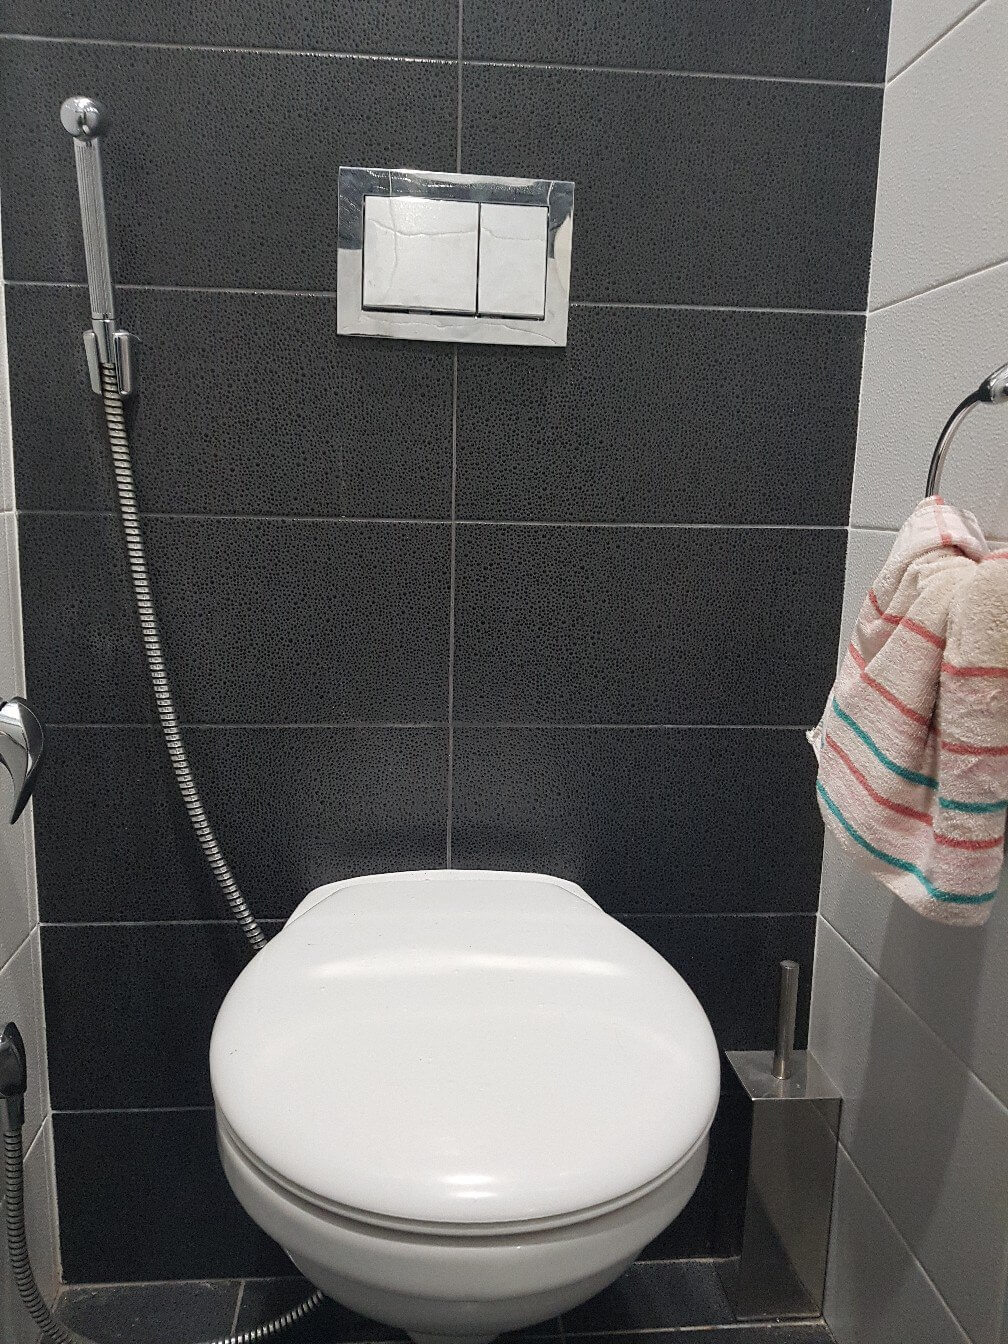 20180404-remont-installacii-tece-1.jpg